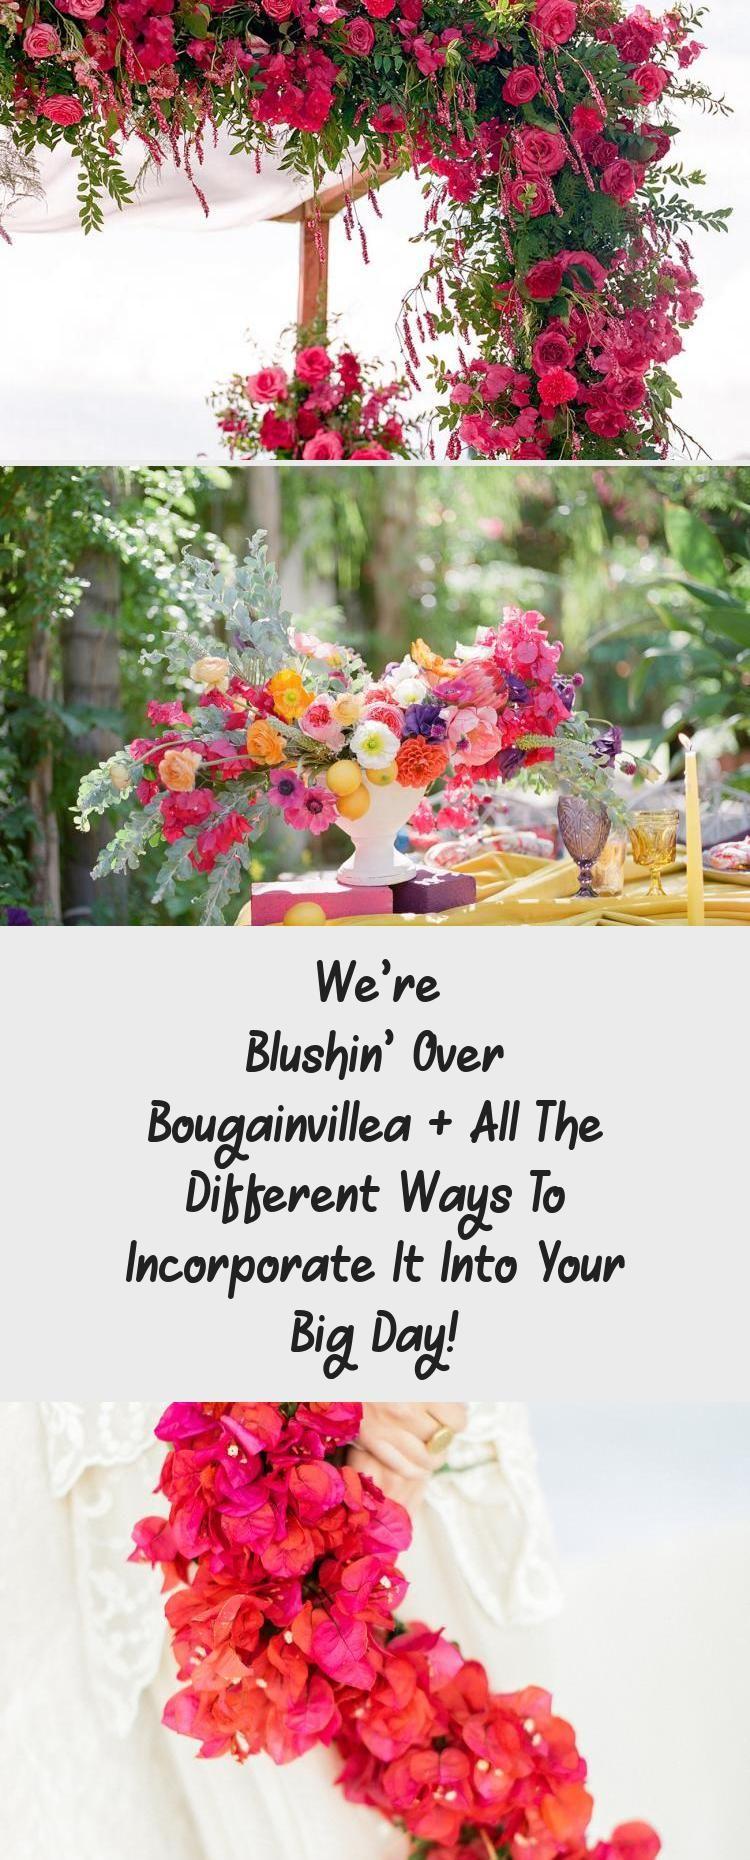 Bougainvillea Tablescape Santorini Weddingdetailsflatlay Romanticweddingdetails Su In 2020 Palm Springs Wedding Photography Palm Springs Wedding Bouquet Photography